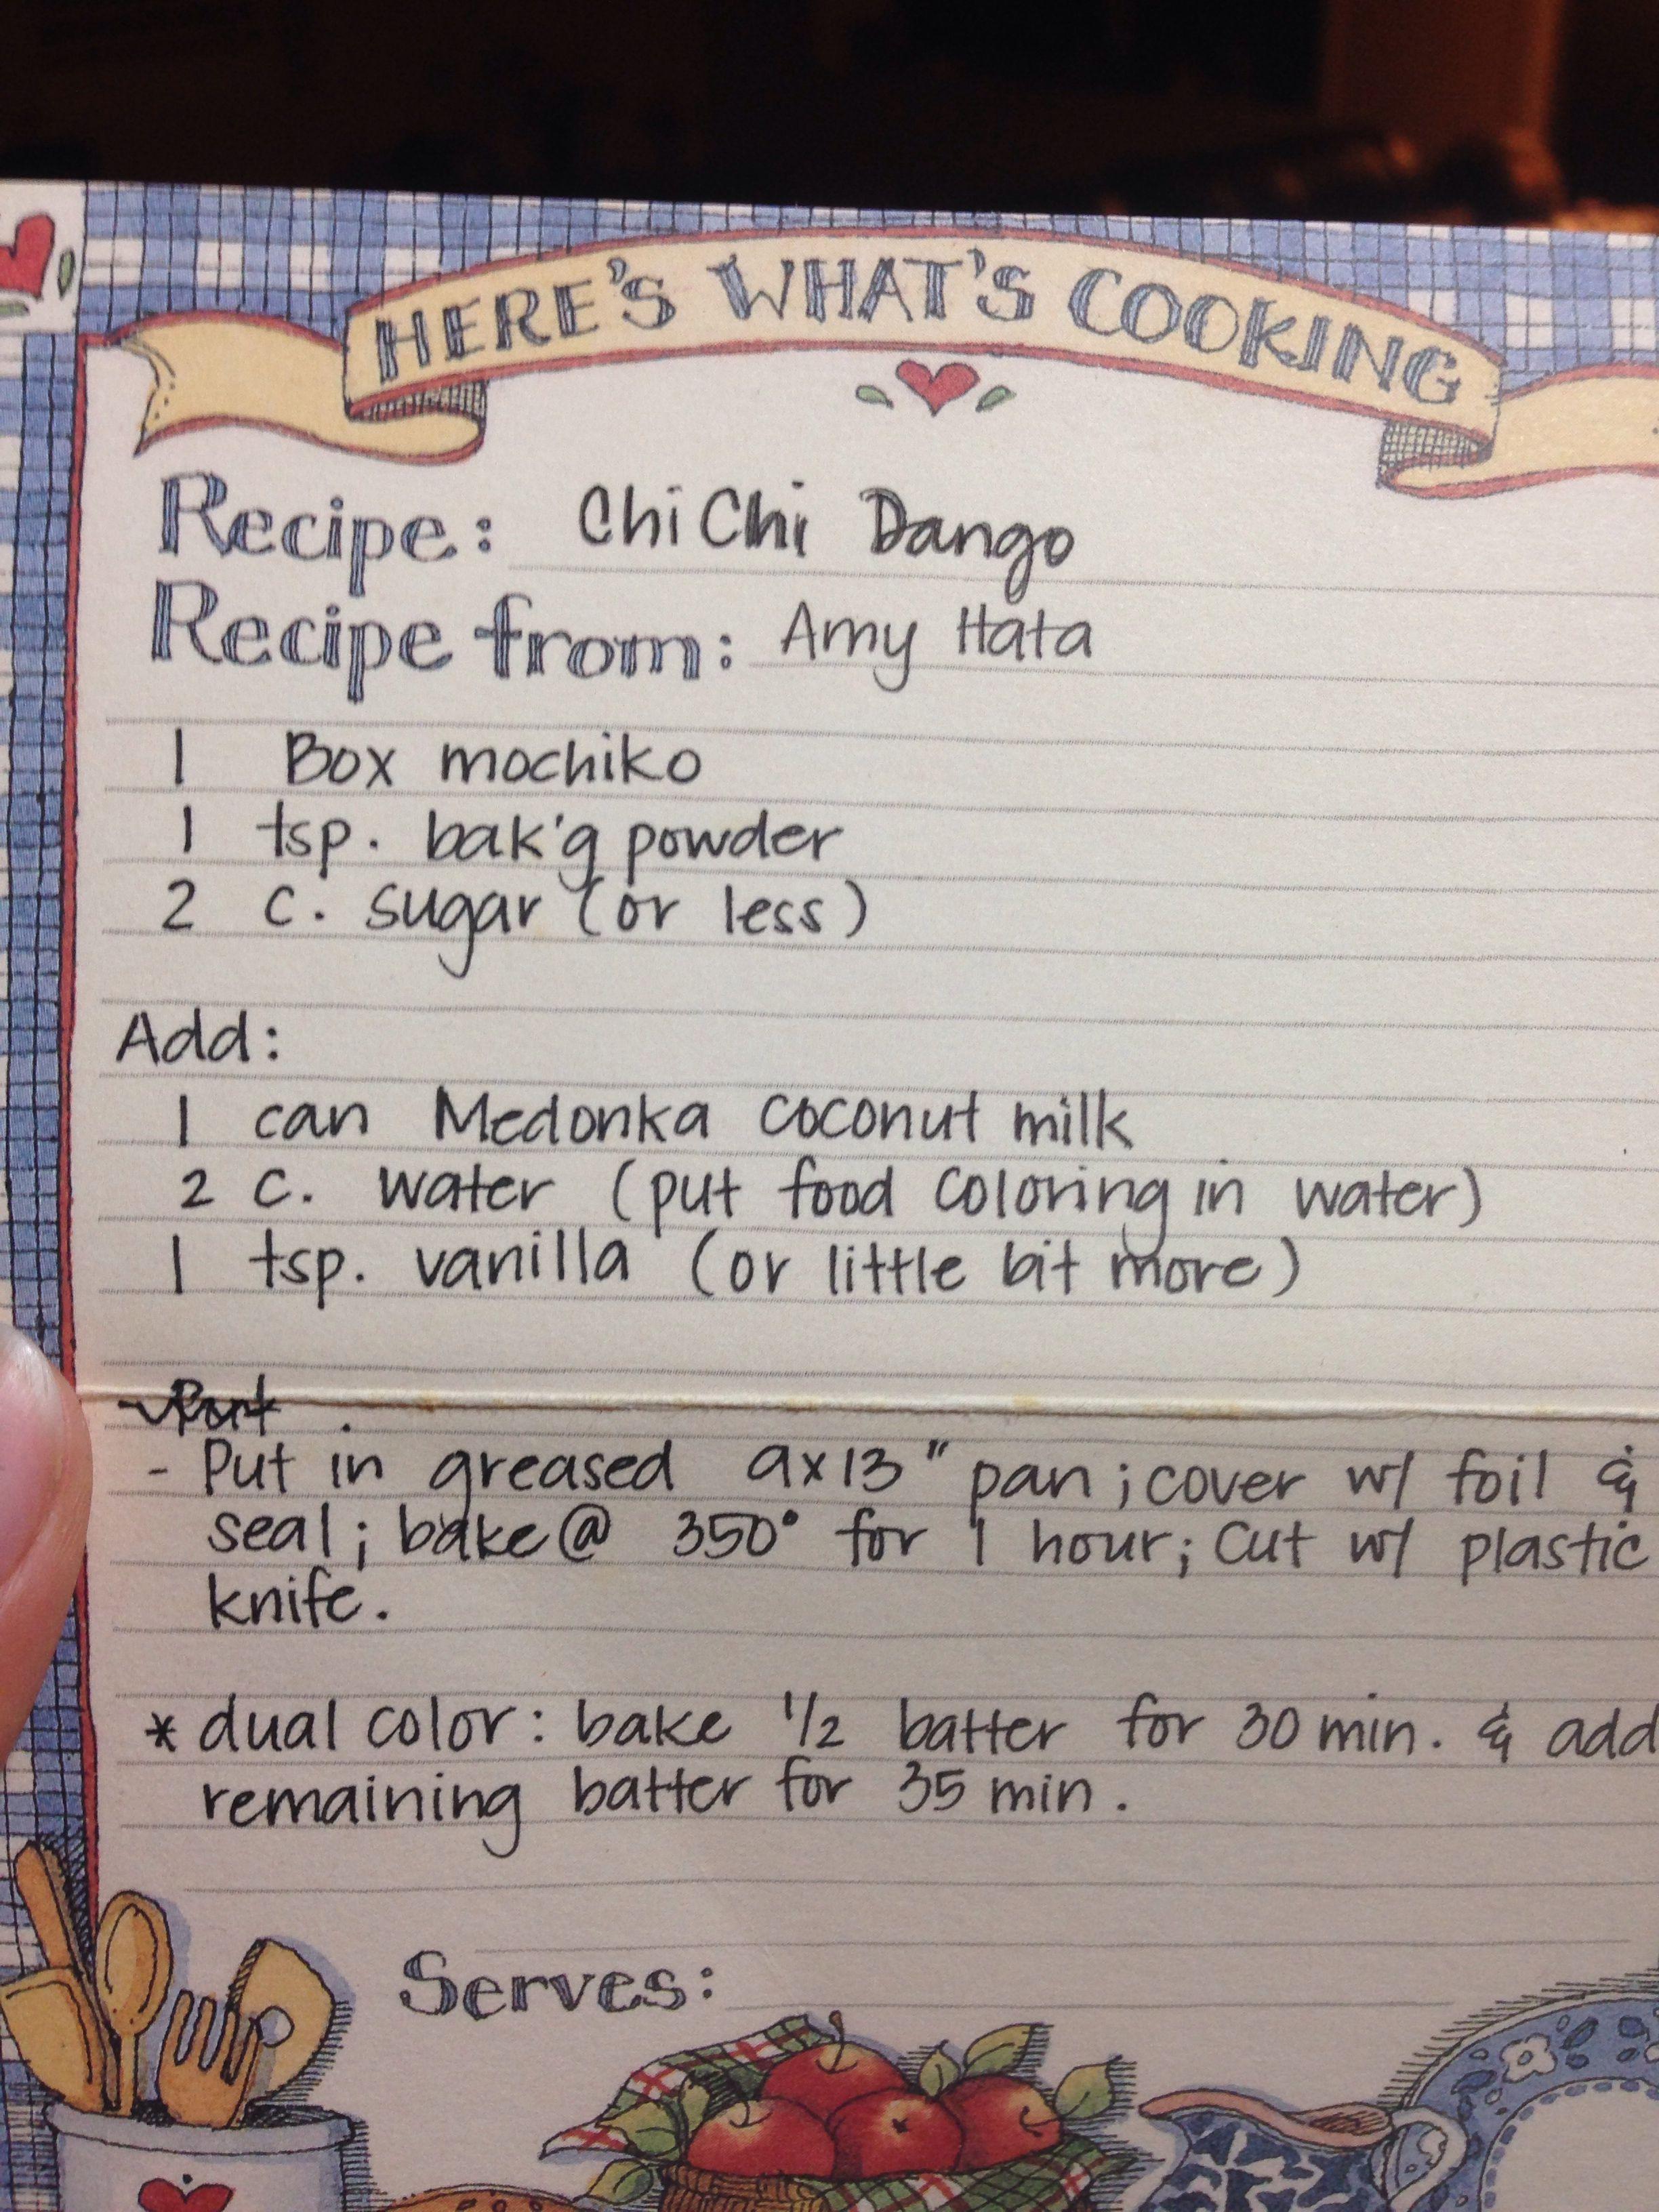 Chichi dango | Recipes | Pinterest | Mochi, Mochi recipe and Food